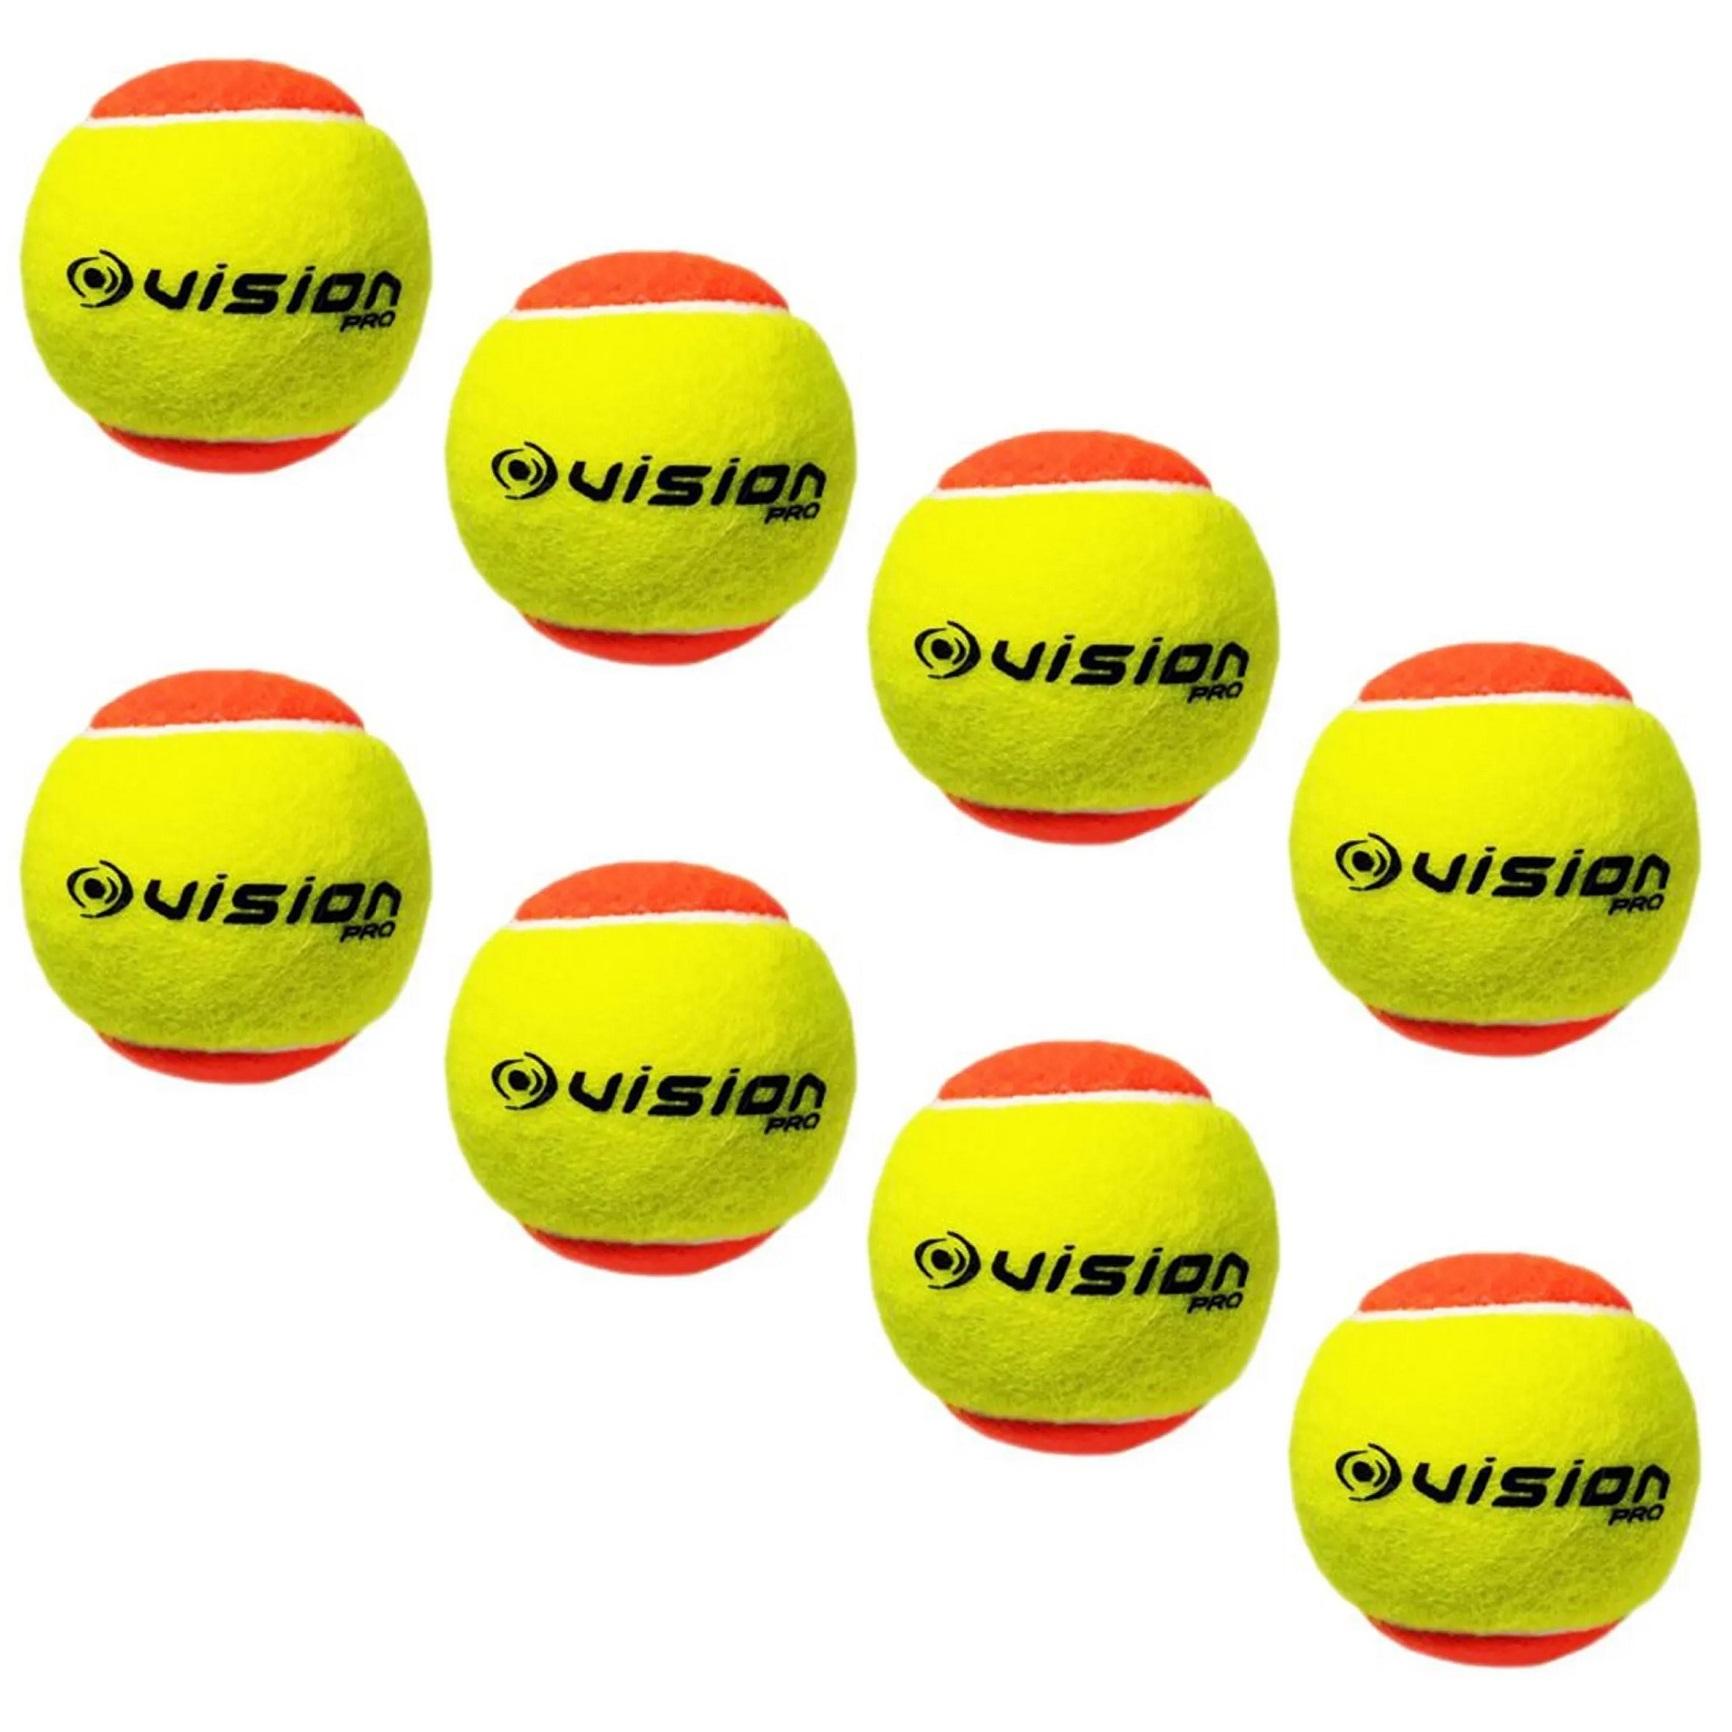 Bola Beach Tennis Vision Pro Kit c/ 8 Bolas